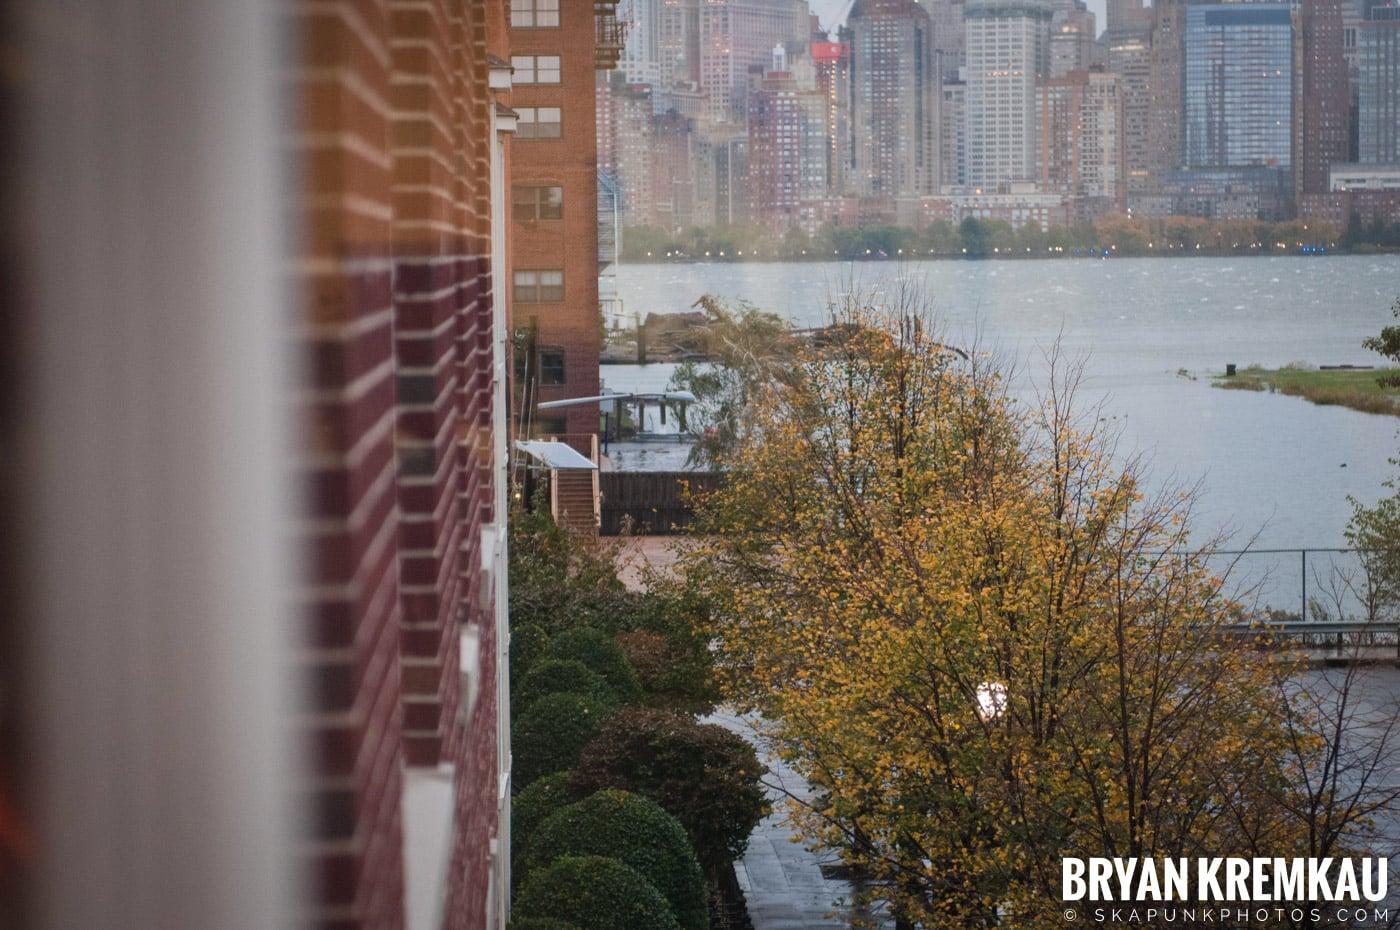 Hurricane Sandy 2012 @ Paulus Hook, Jersey City - 10.29.12 - 10.30.12 (60)